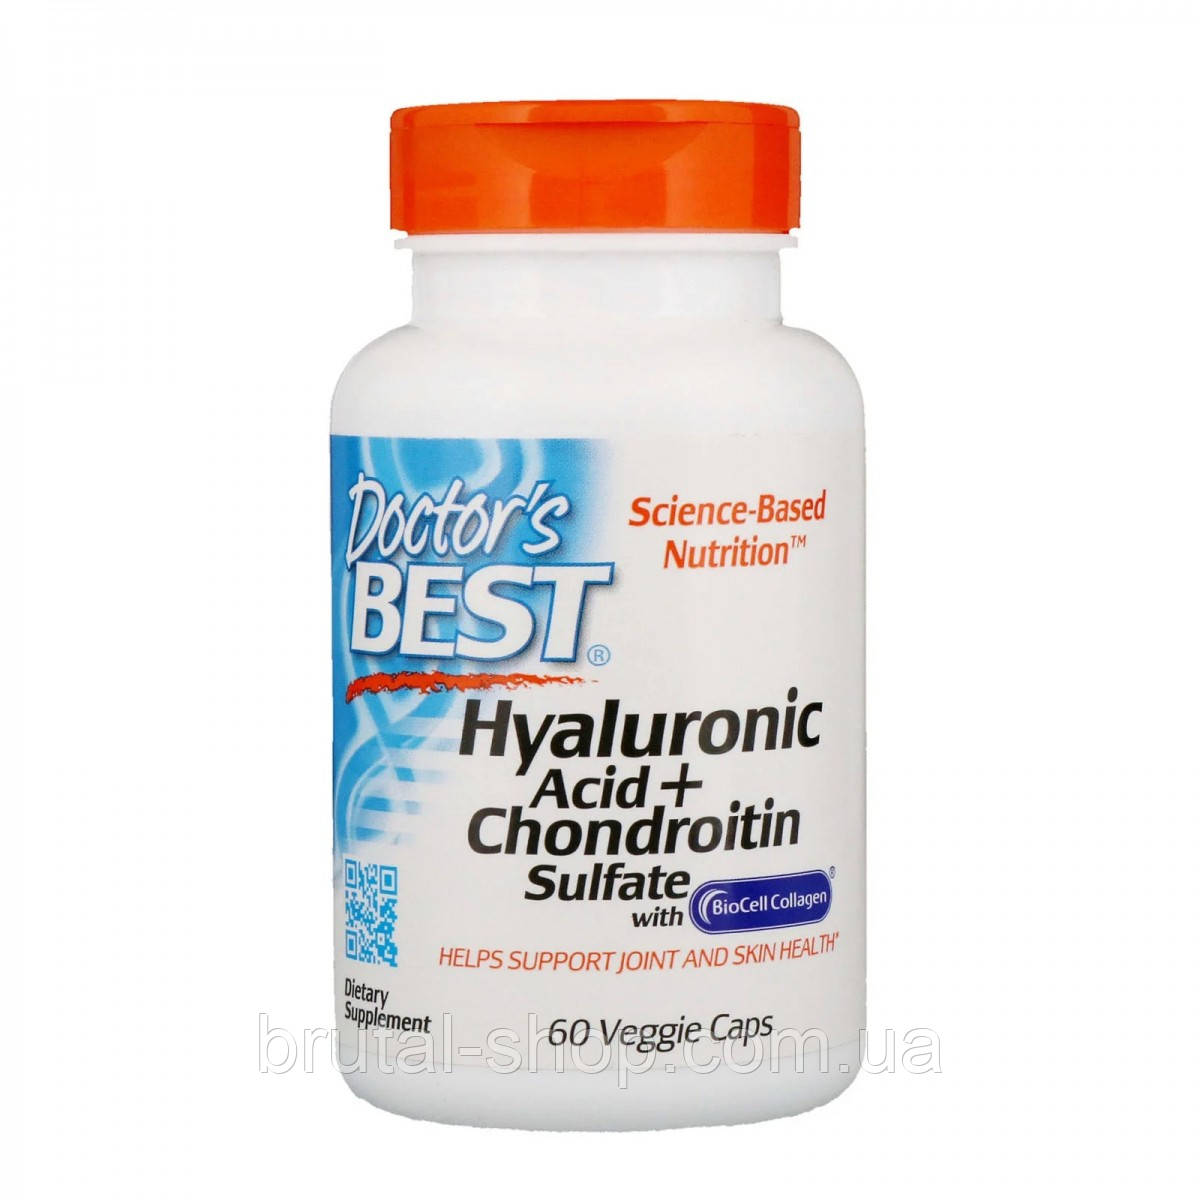 Хондропротектор, Doctor's s Best Hyaluronic Acid with Chondroitin Sulfate 60 (caps)